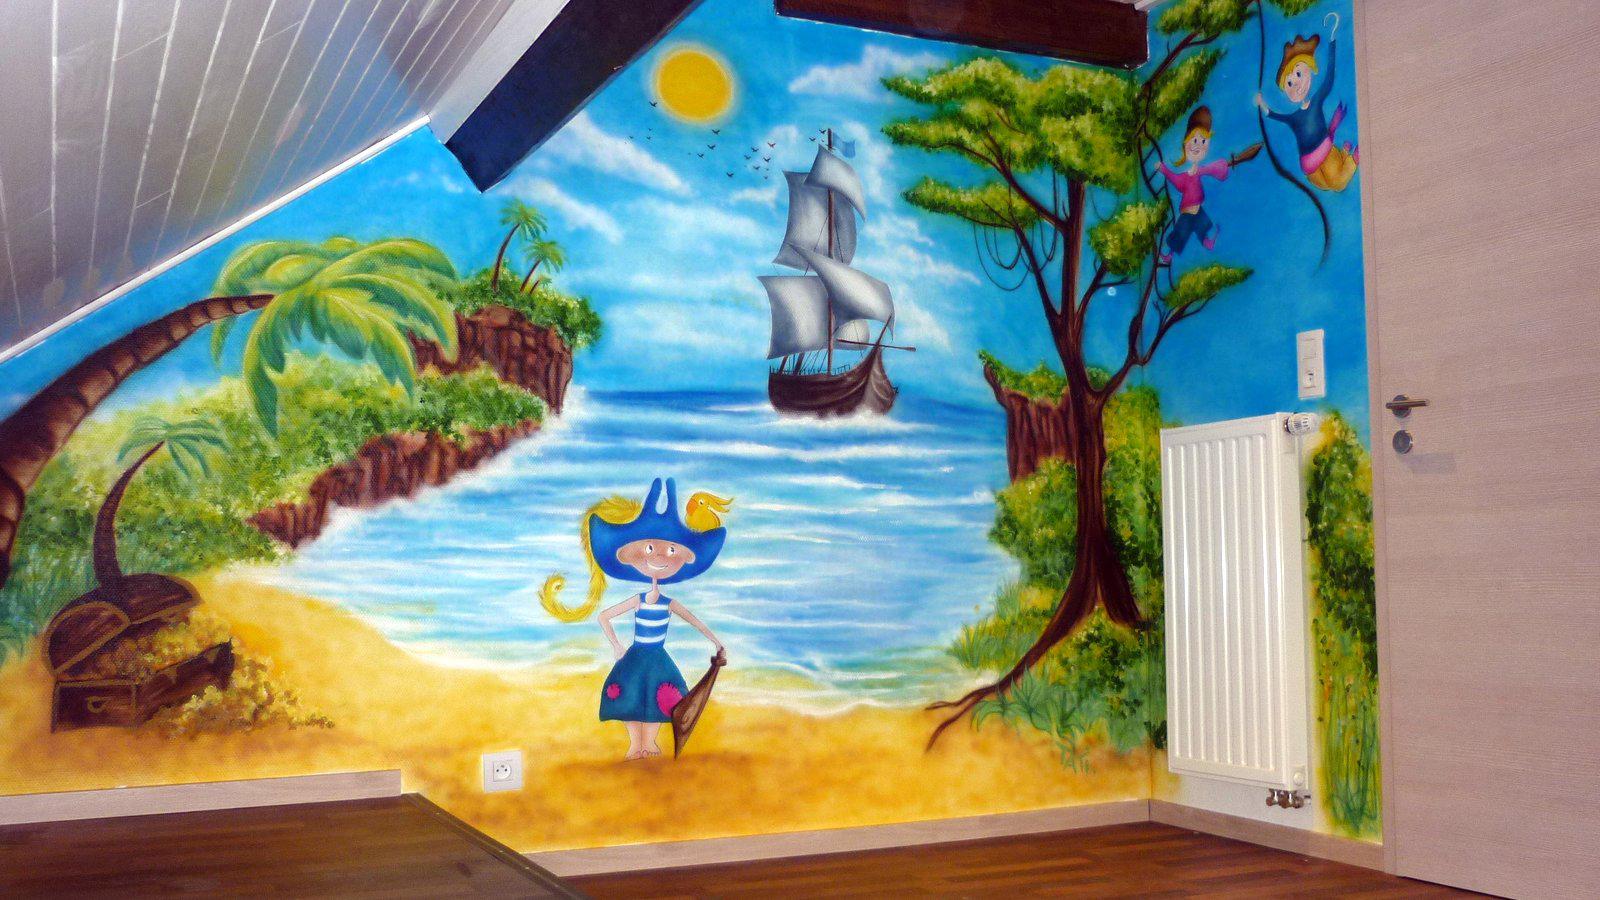 Chambre Garcon Theme Pirate : Décor mural chambre d enfant